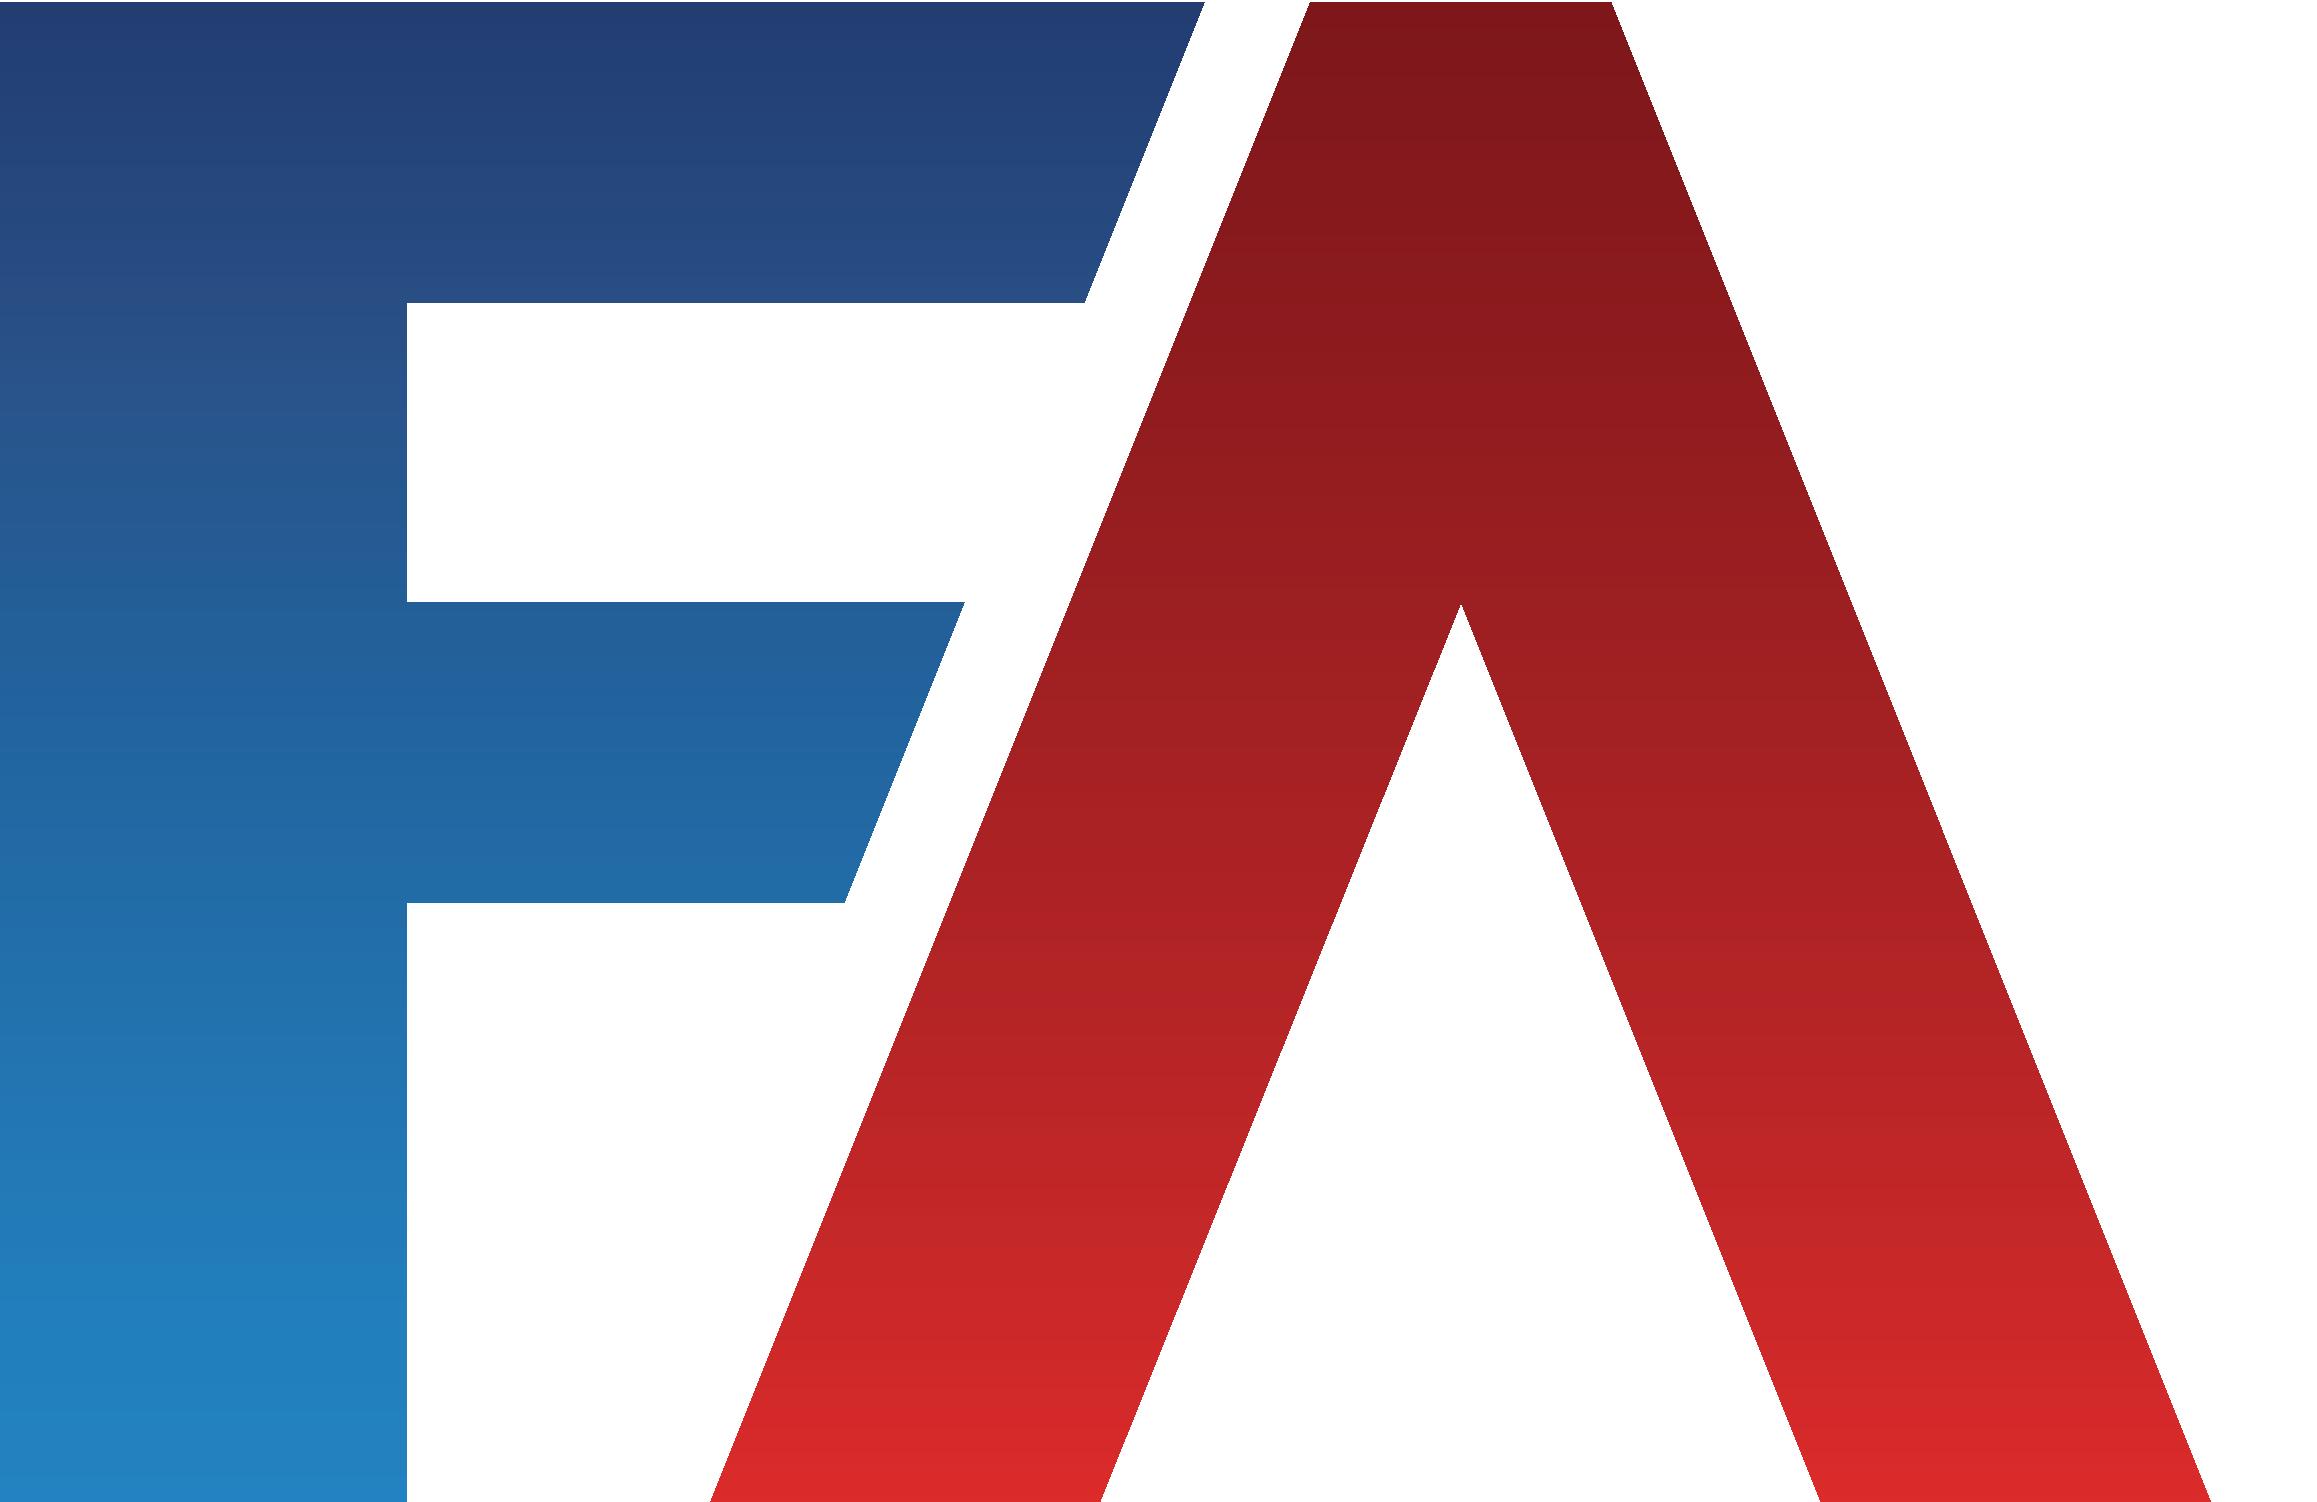 2015 Fantasy Football Leagues: The FFPC | FantasyAlarm.com